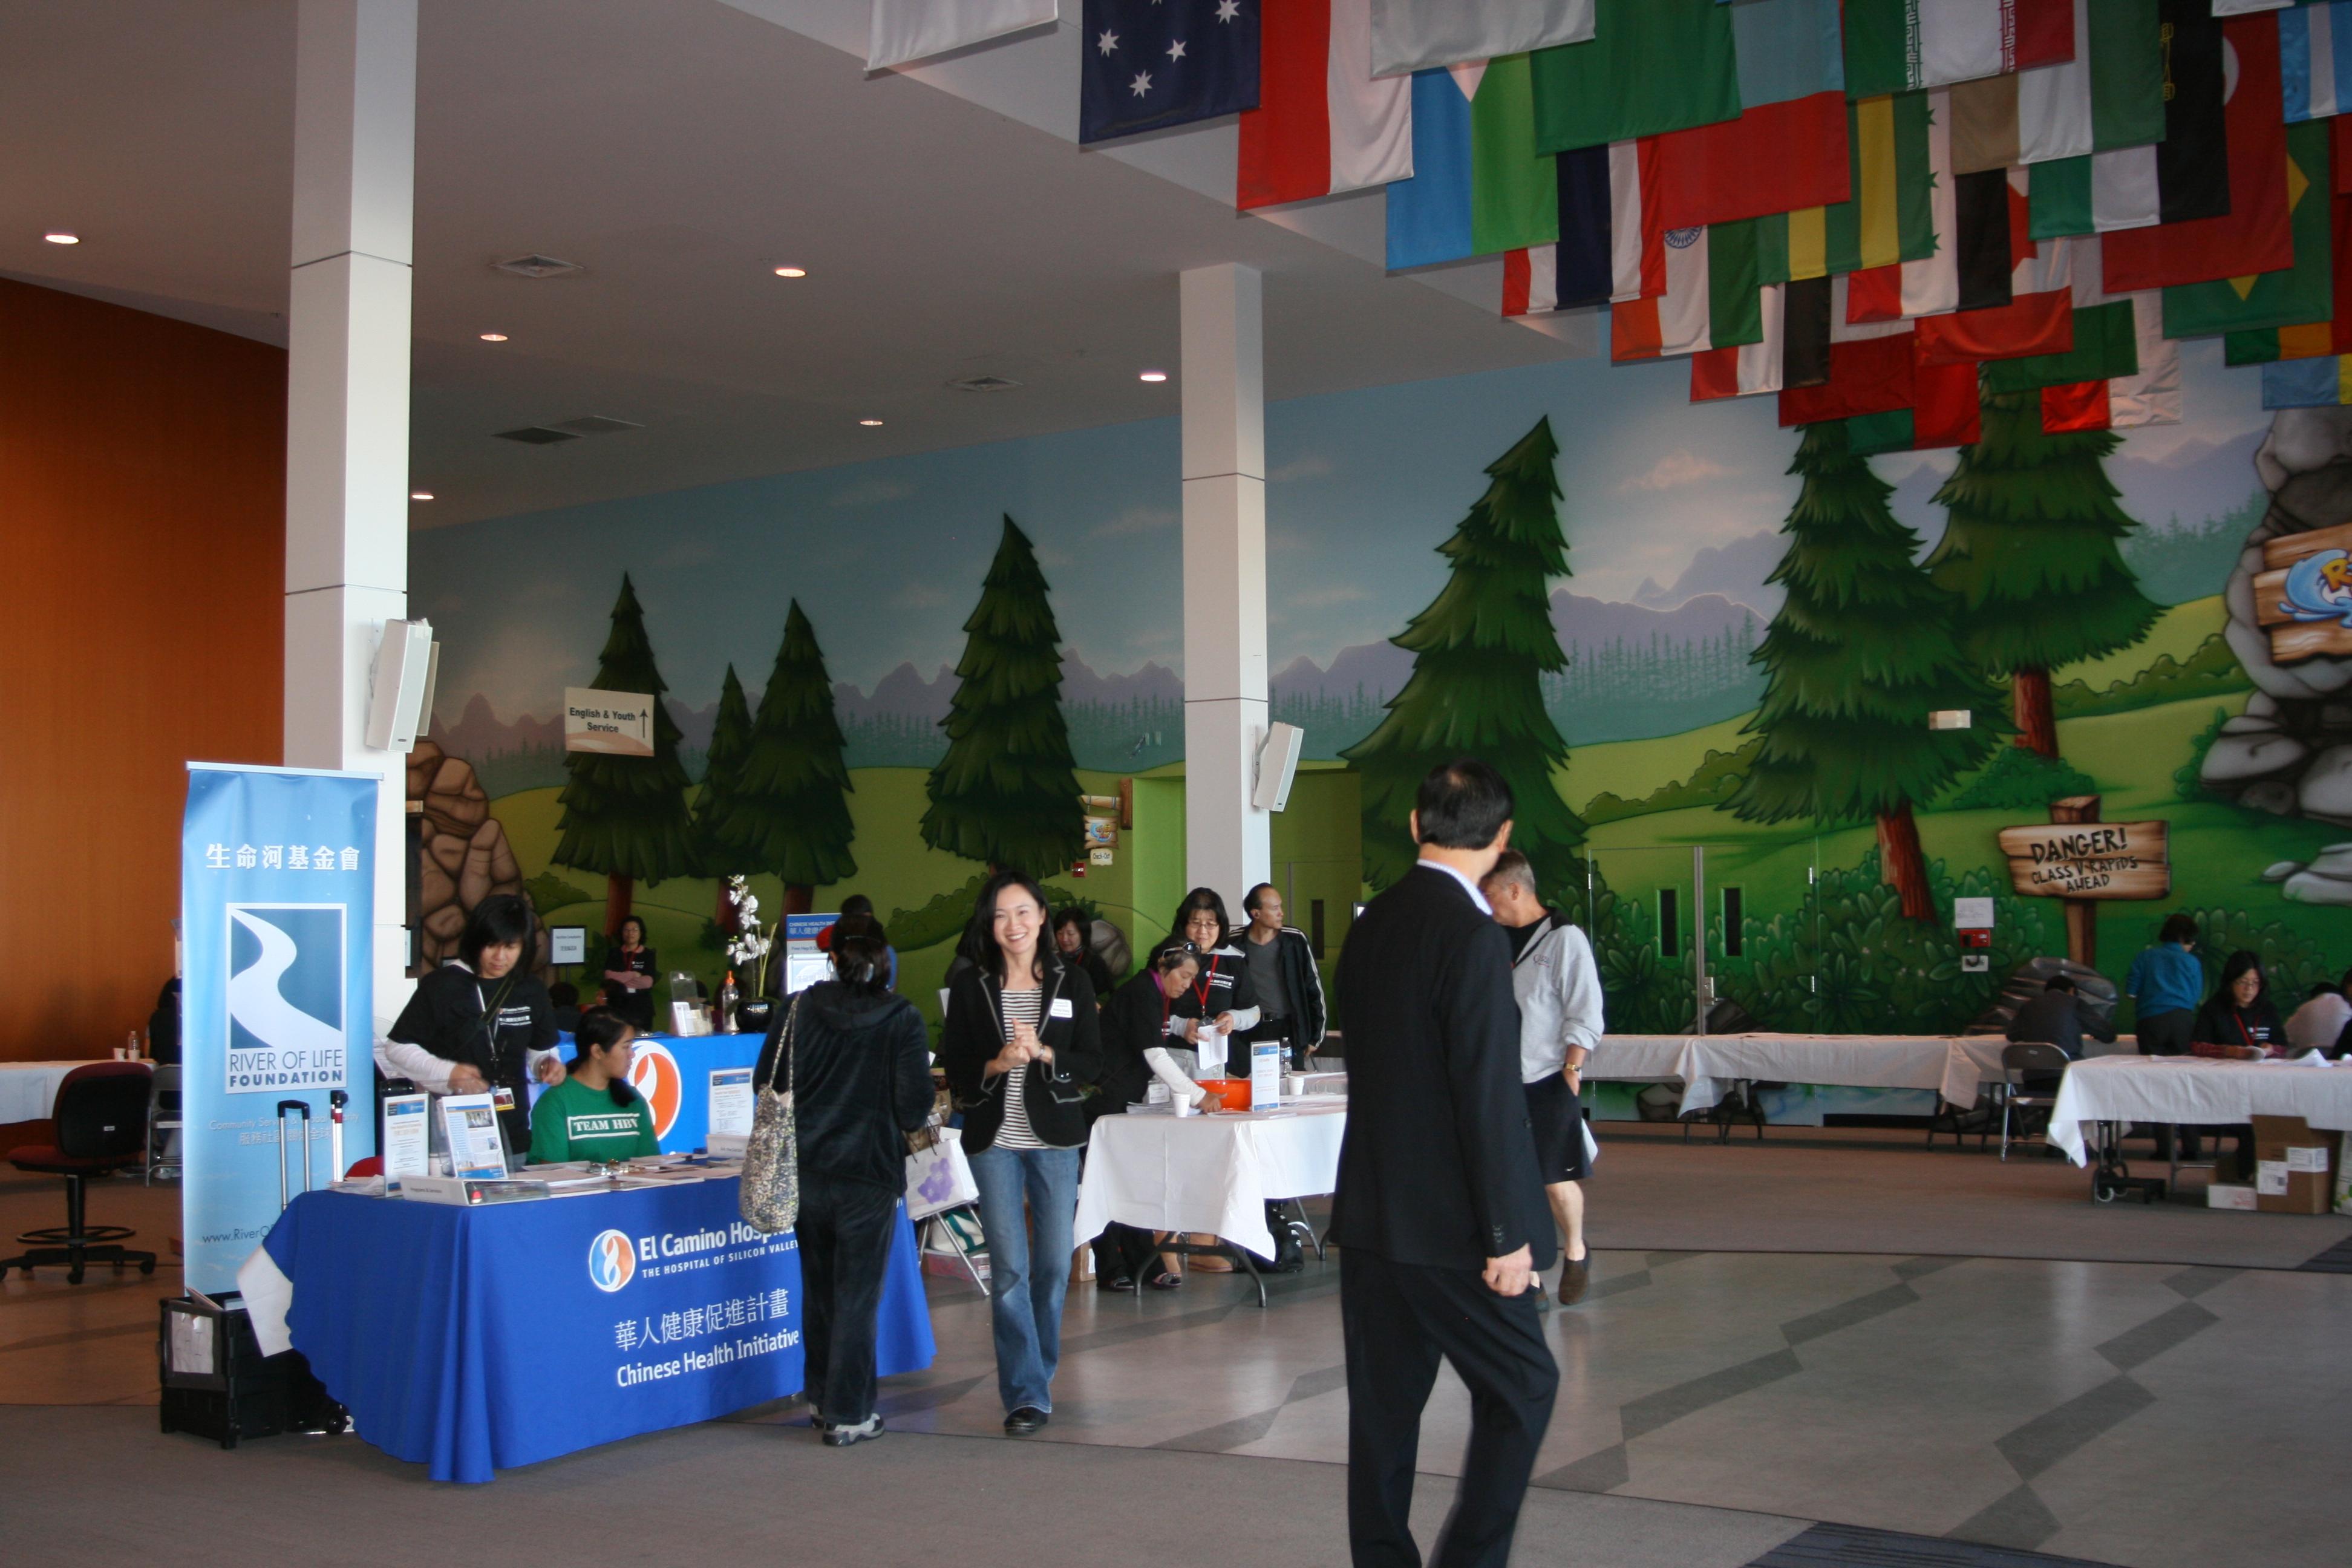 Screening for Hepatitis B: El Camino Hospital Health Fair